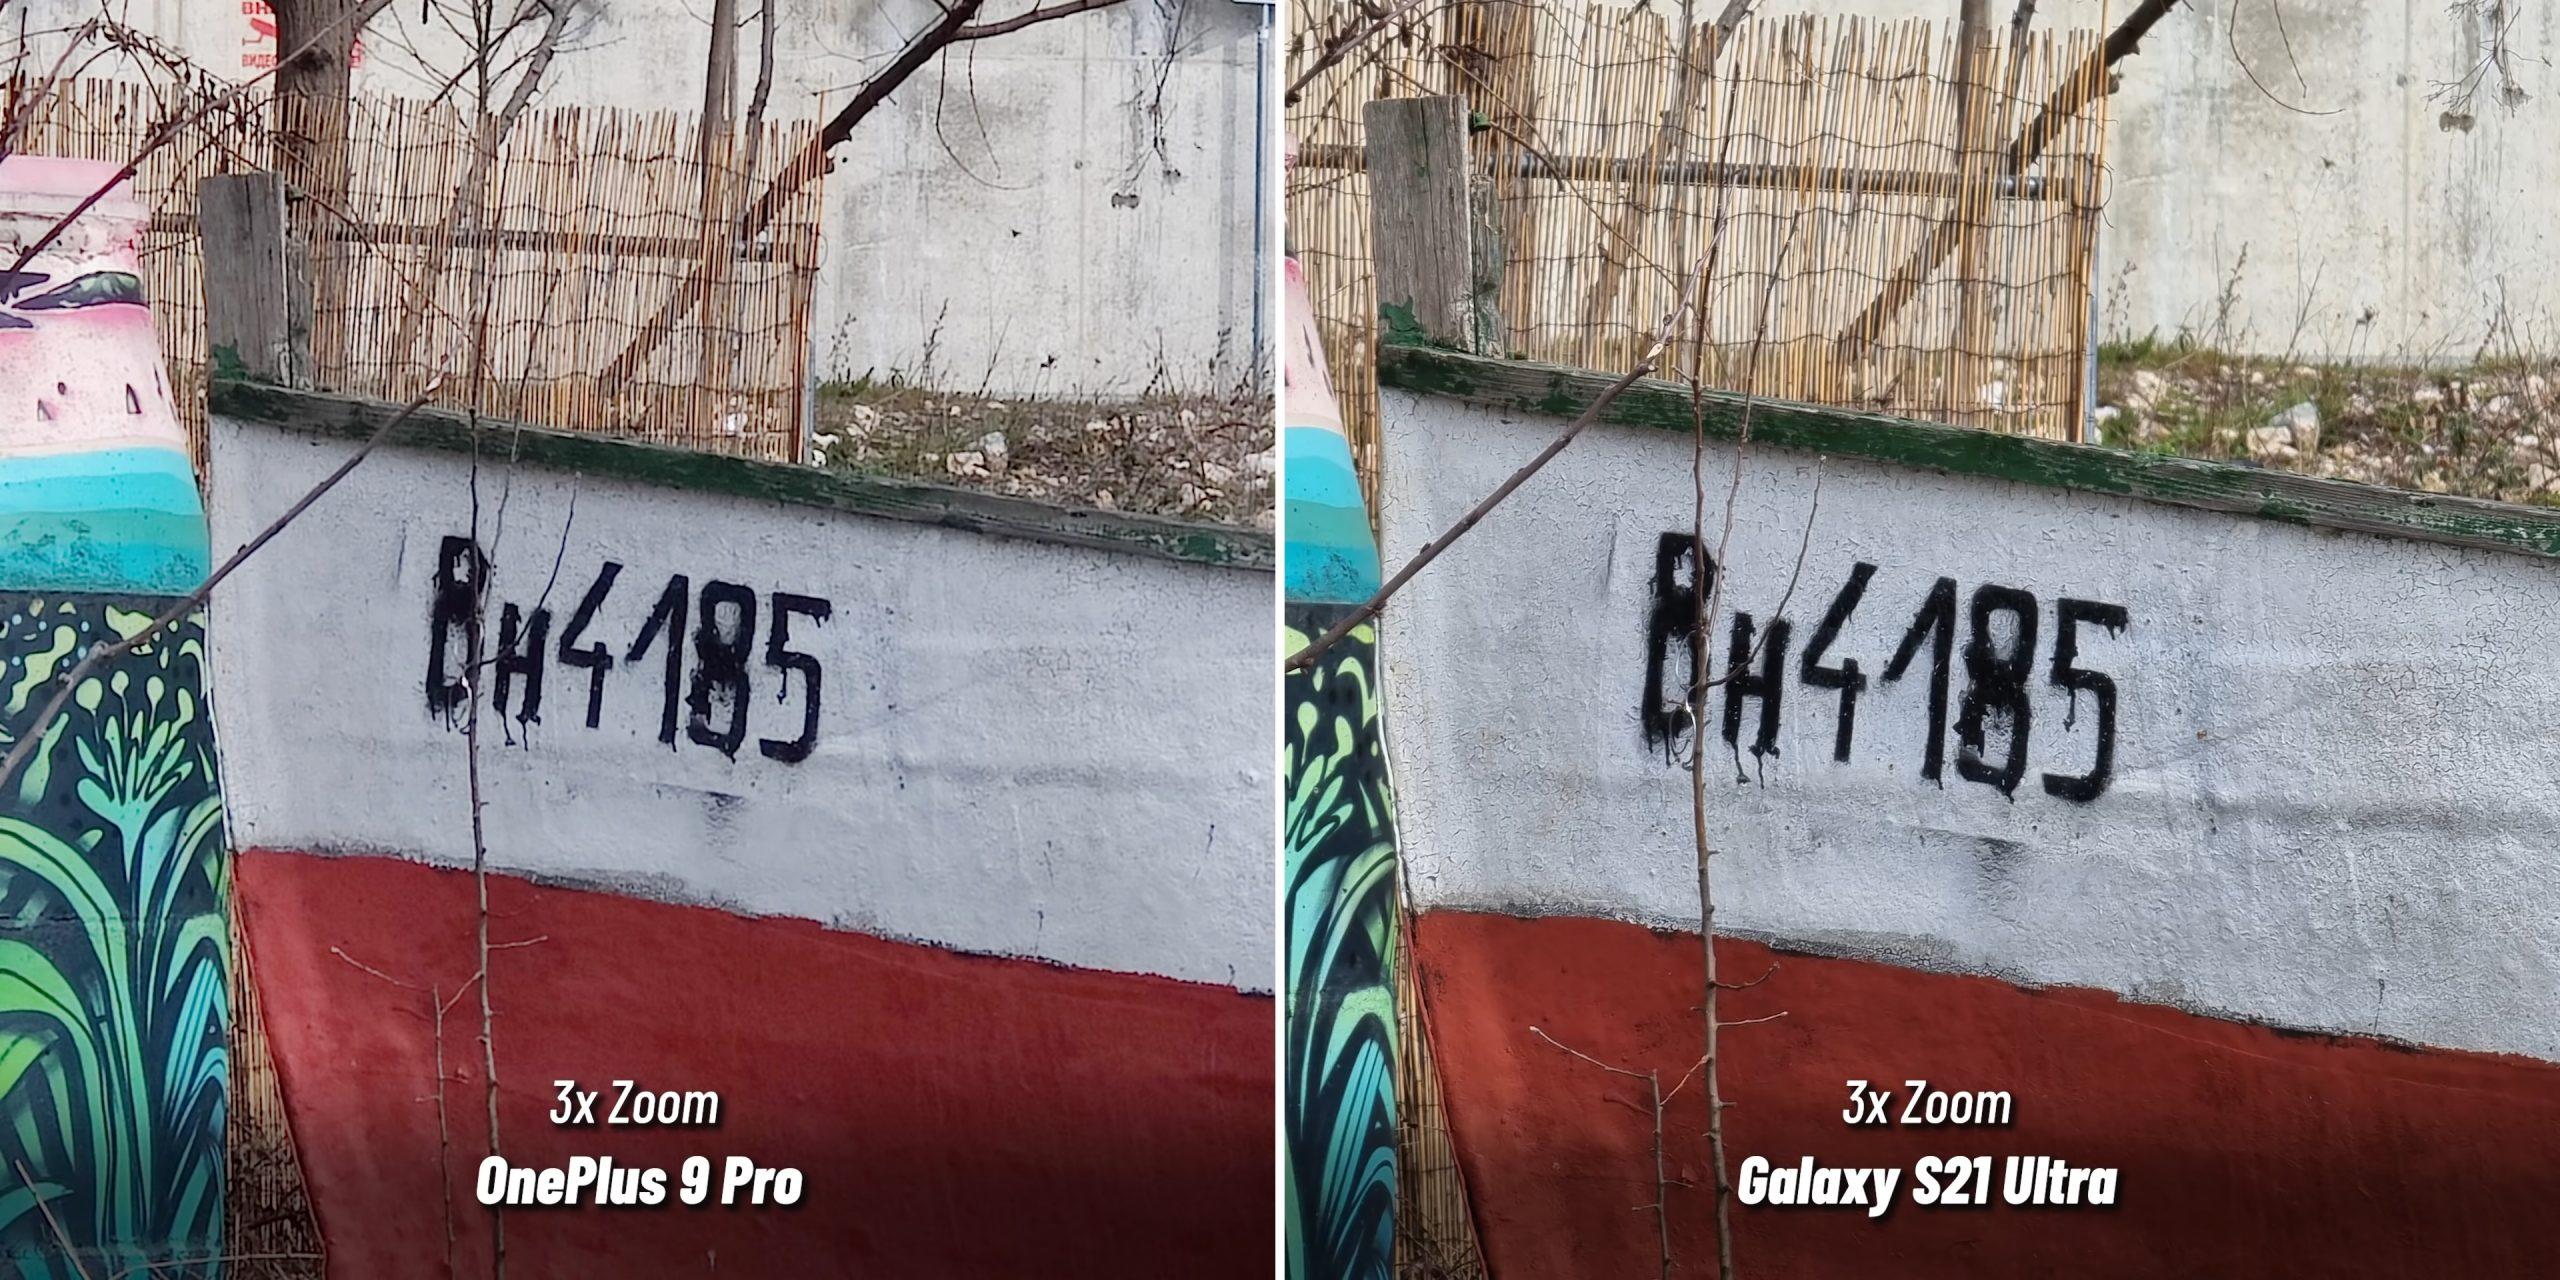 OnePlus 9 Pro и Galaxy S21 Ultra сошлись в фотобитве. Кто кого?